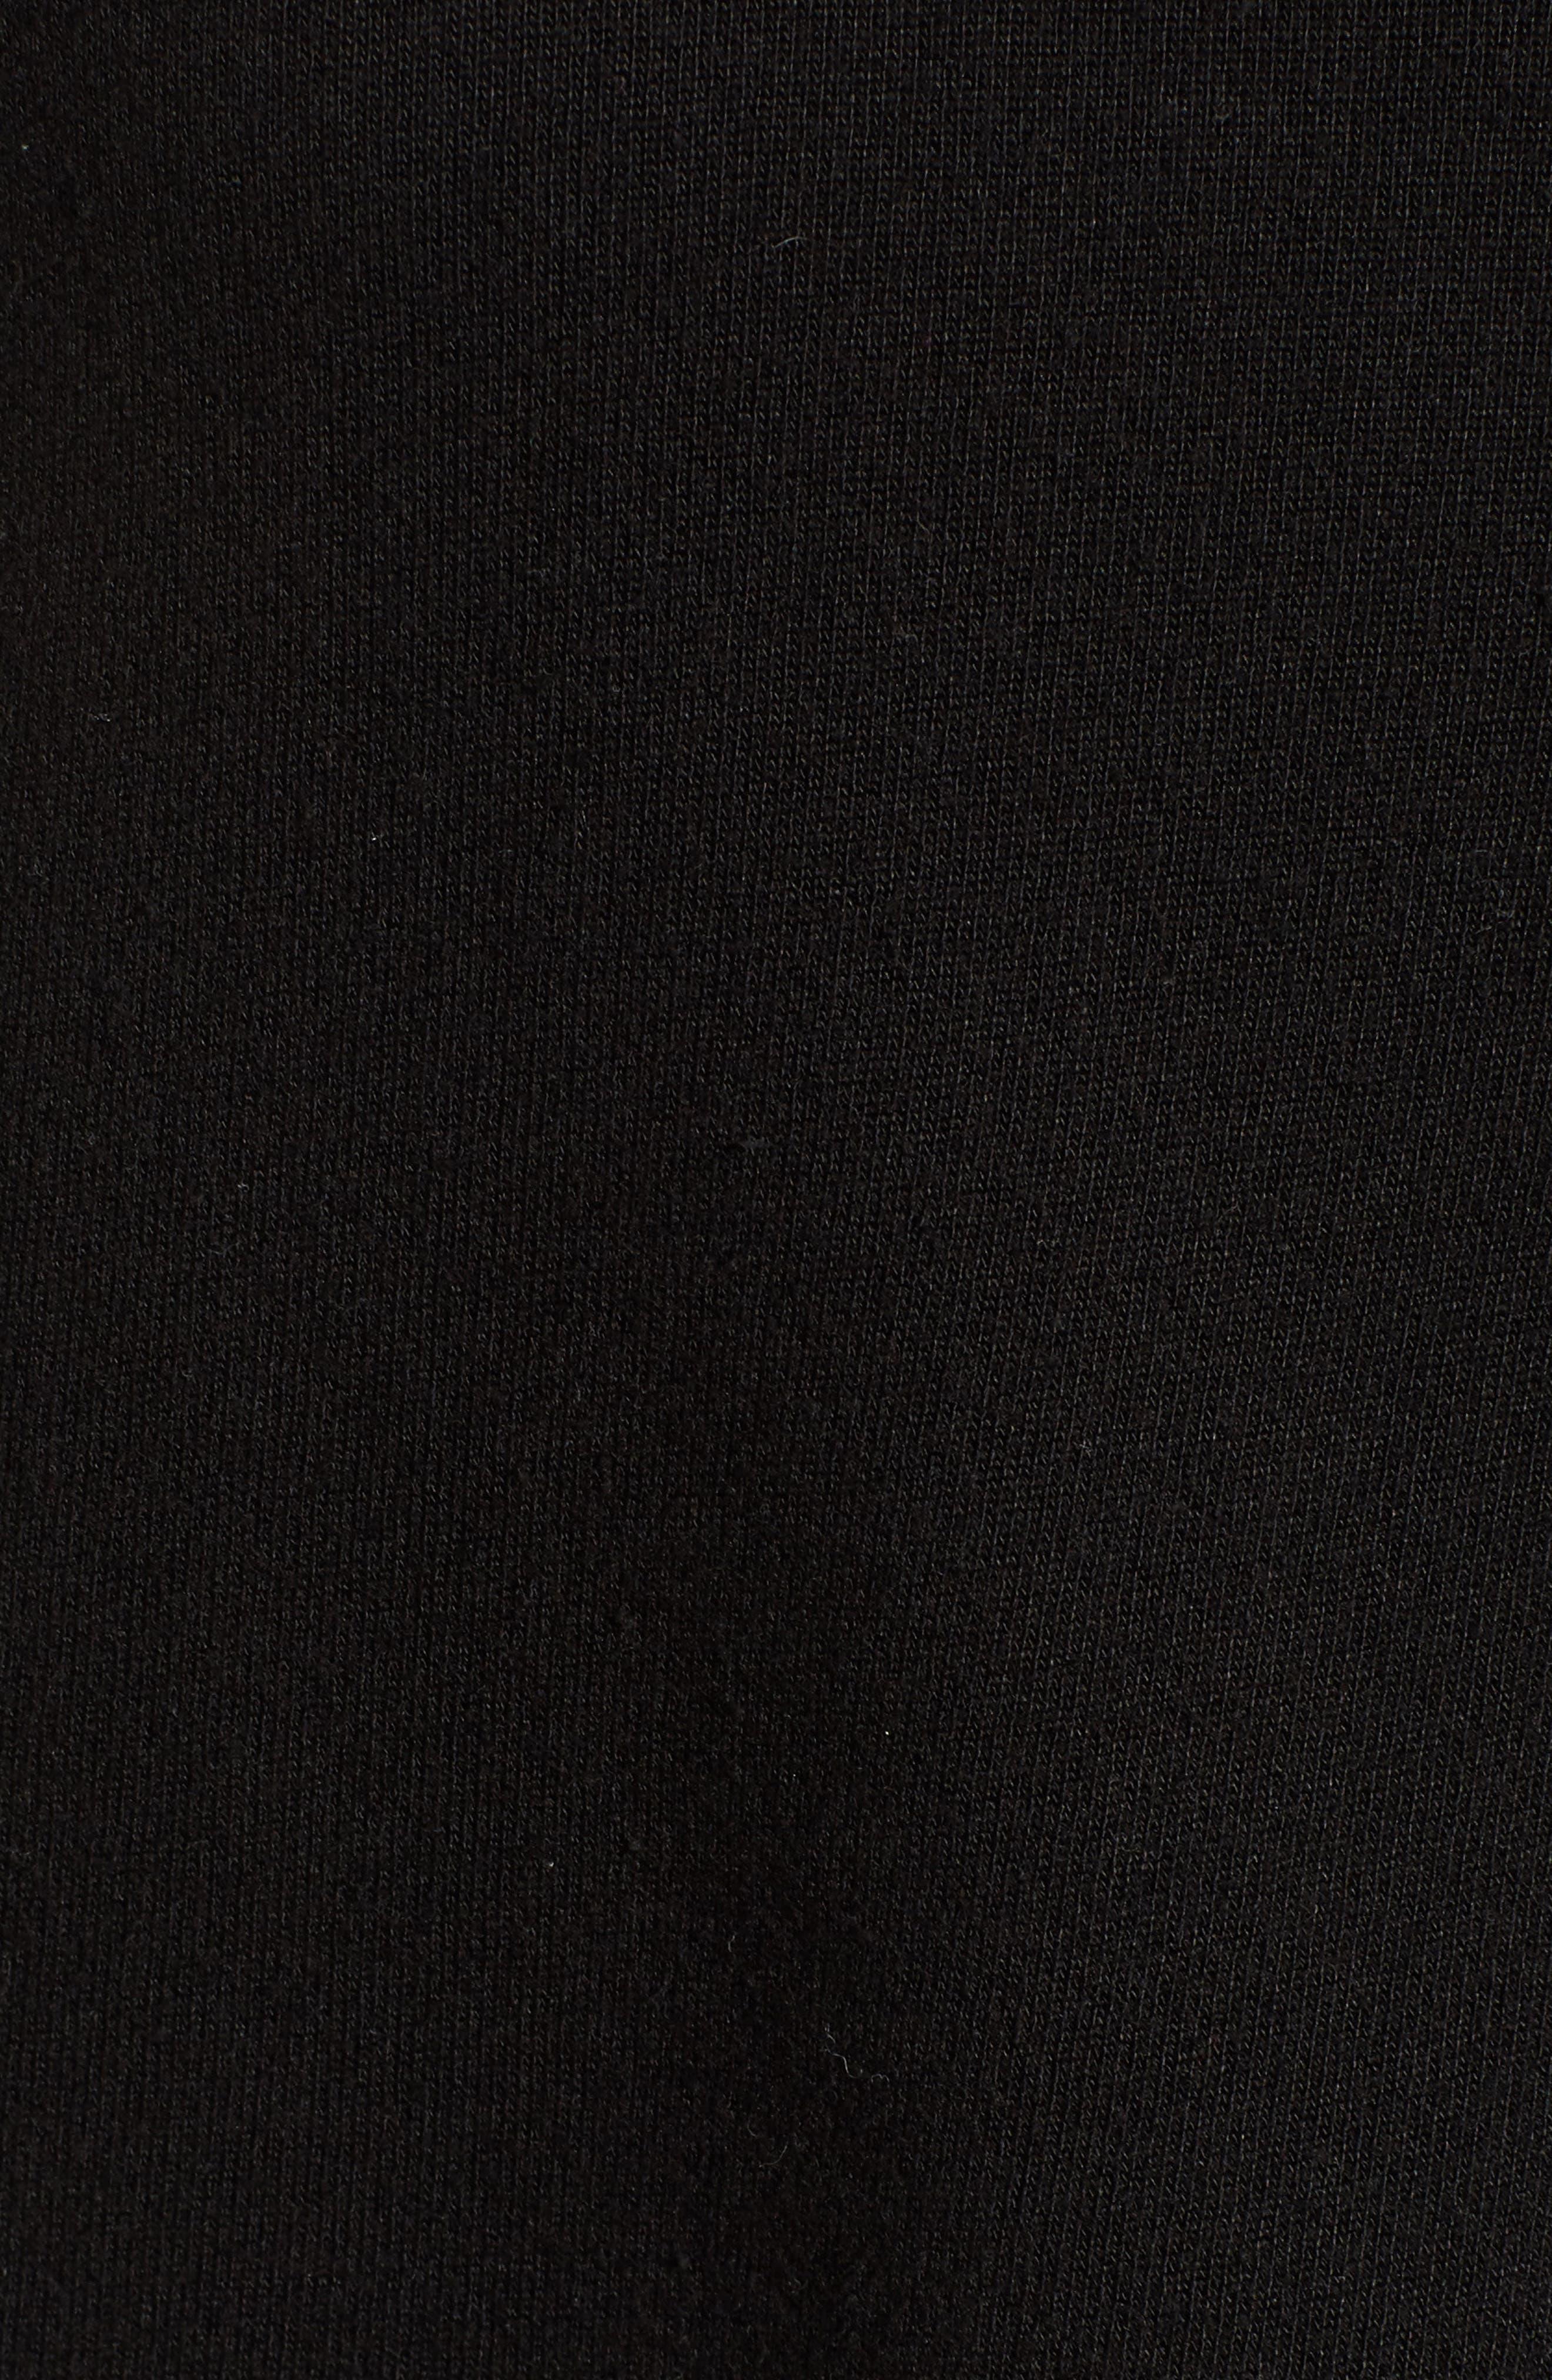 Helix Turtleneck Sweatshirt,                             Alternate thumbnail 5, color,                             001